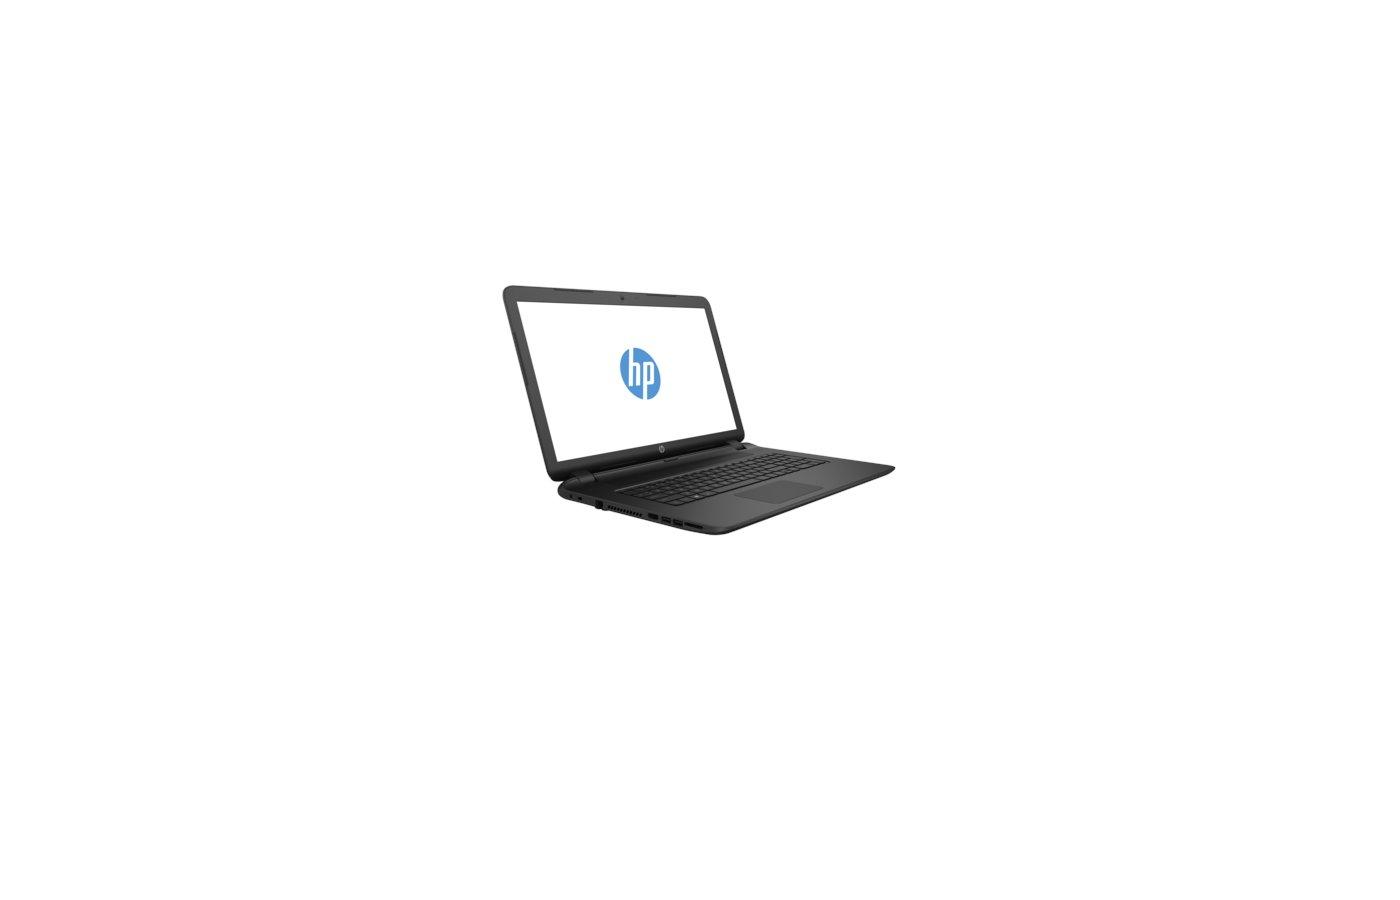 Ноутбук HP 17-p103UR /P0T42EA/ AMD A6 6310/4Gb/500Gb/Radeon R4/DVDSM/17.3HD+/WiFi/Win10